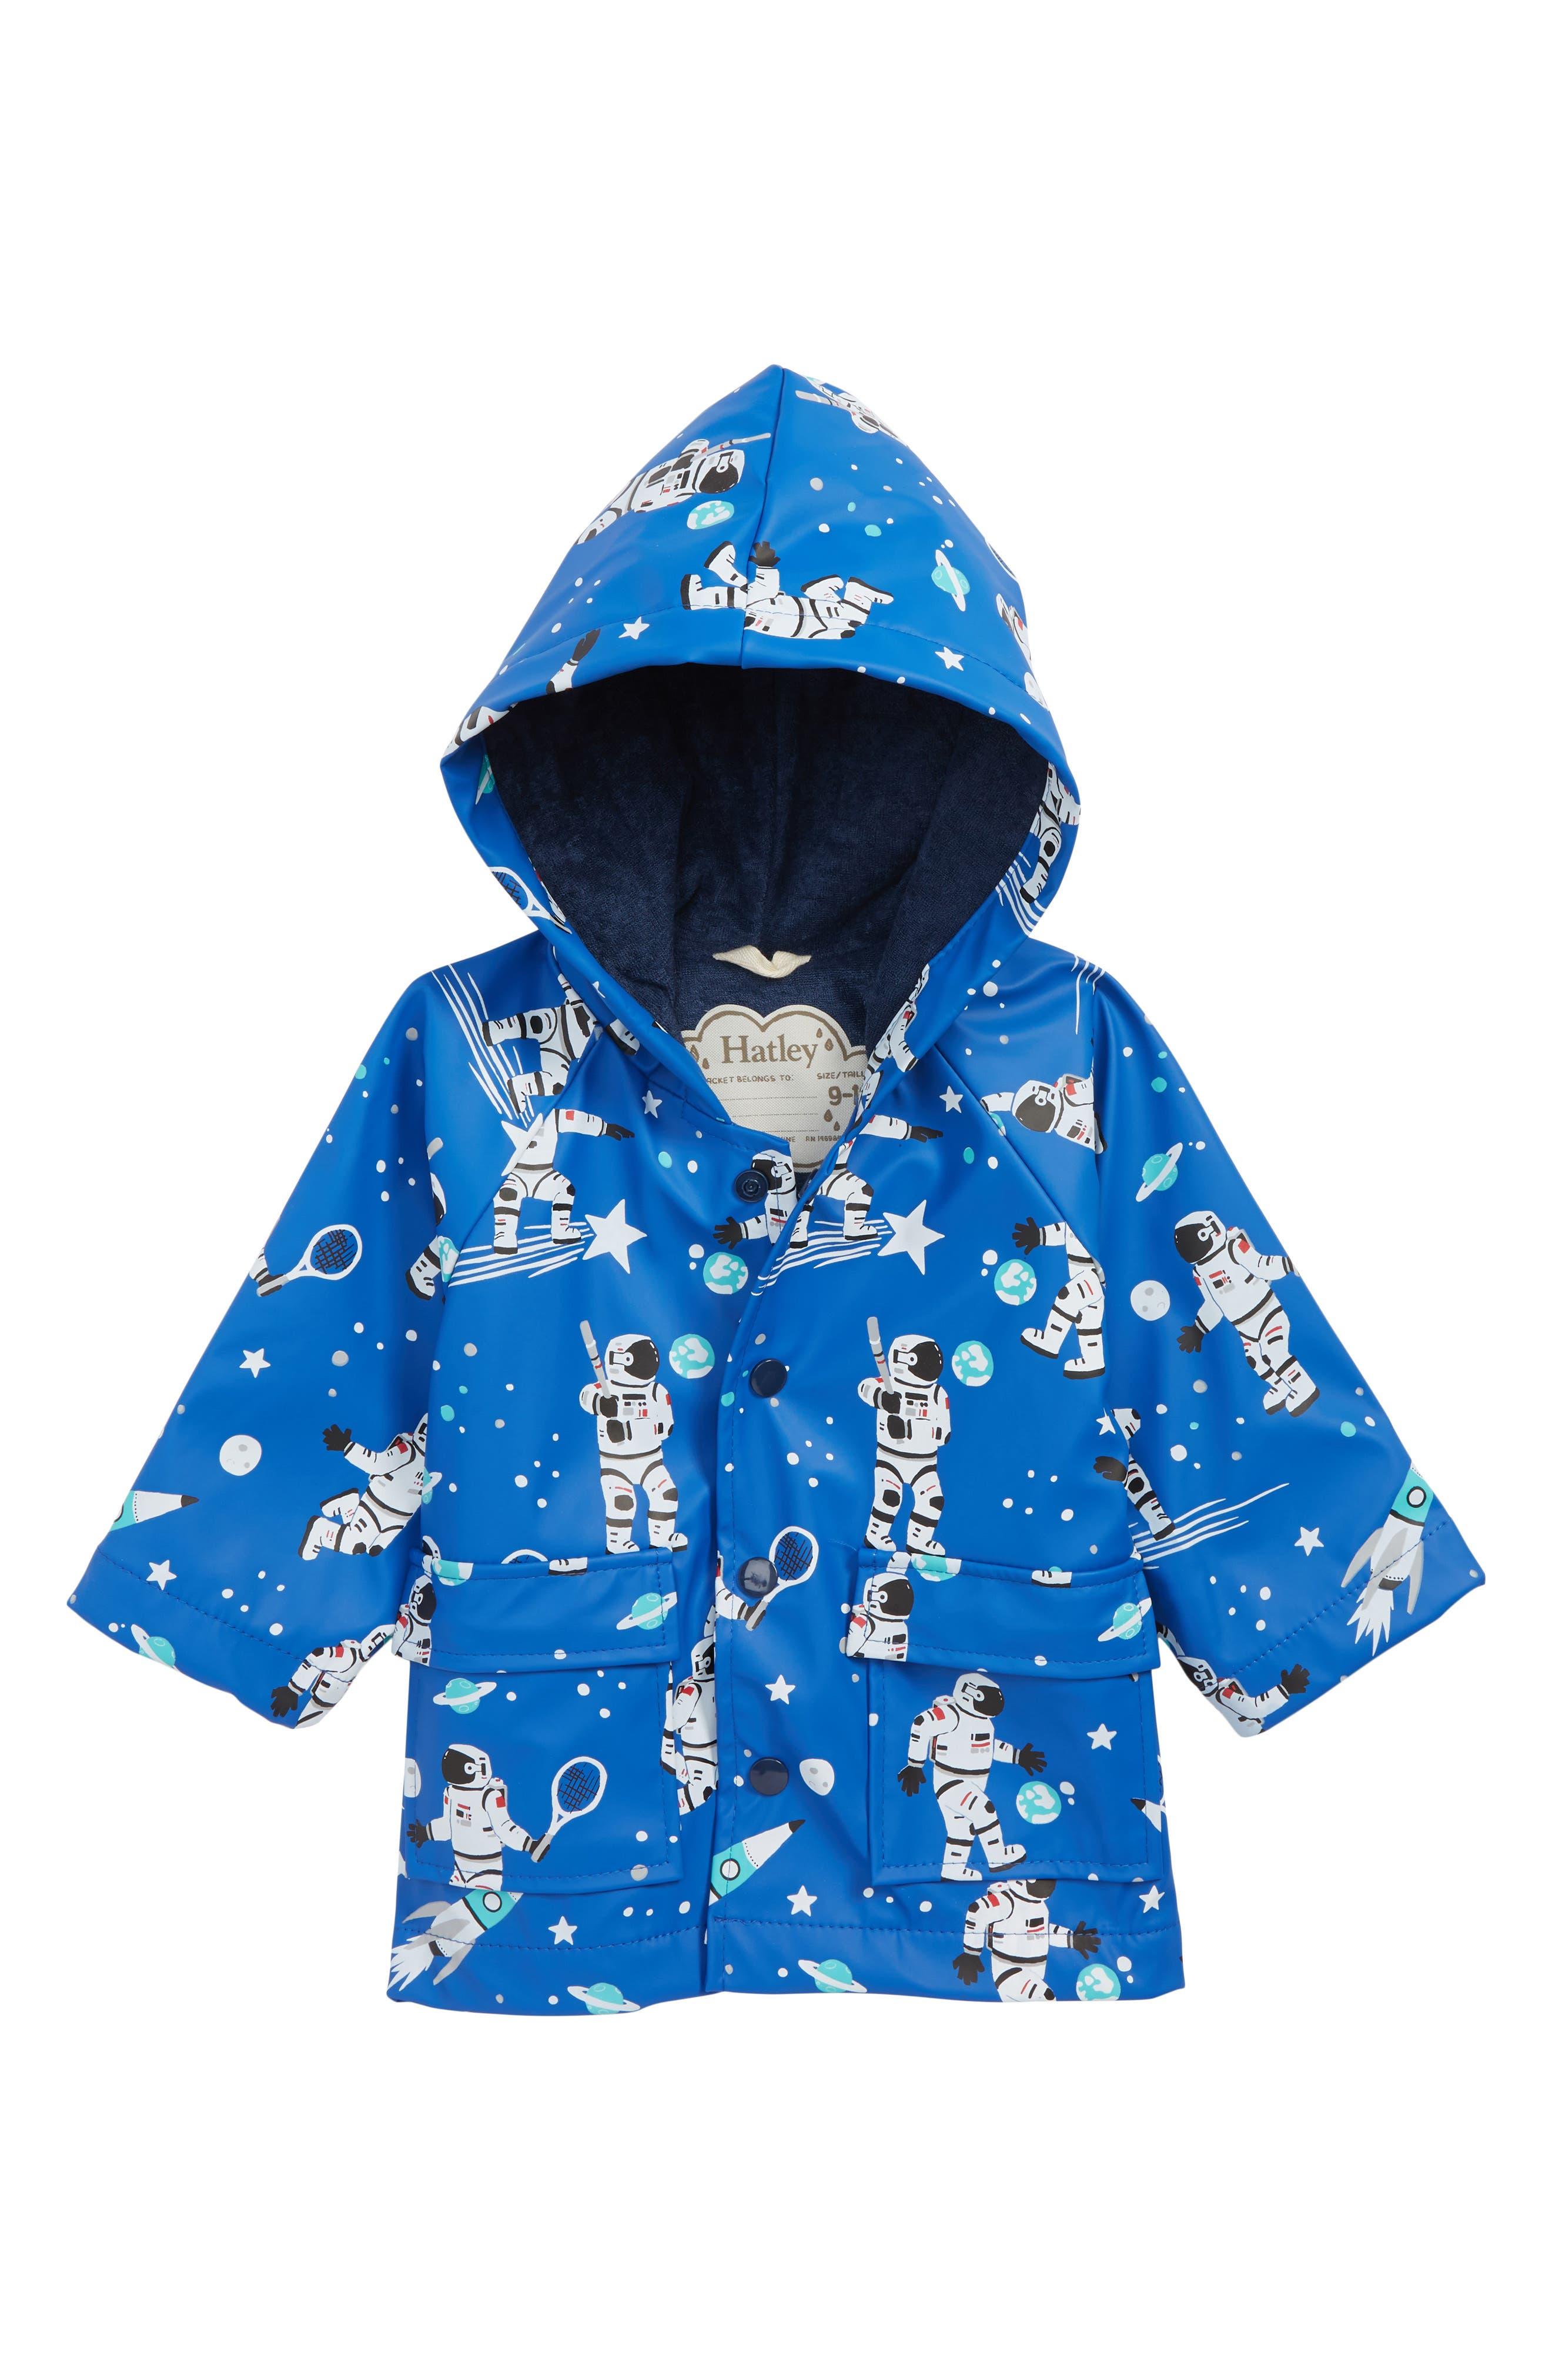 Infant Boys Hatley Astronauts Waterproof Hooded Raincoat